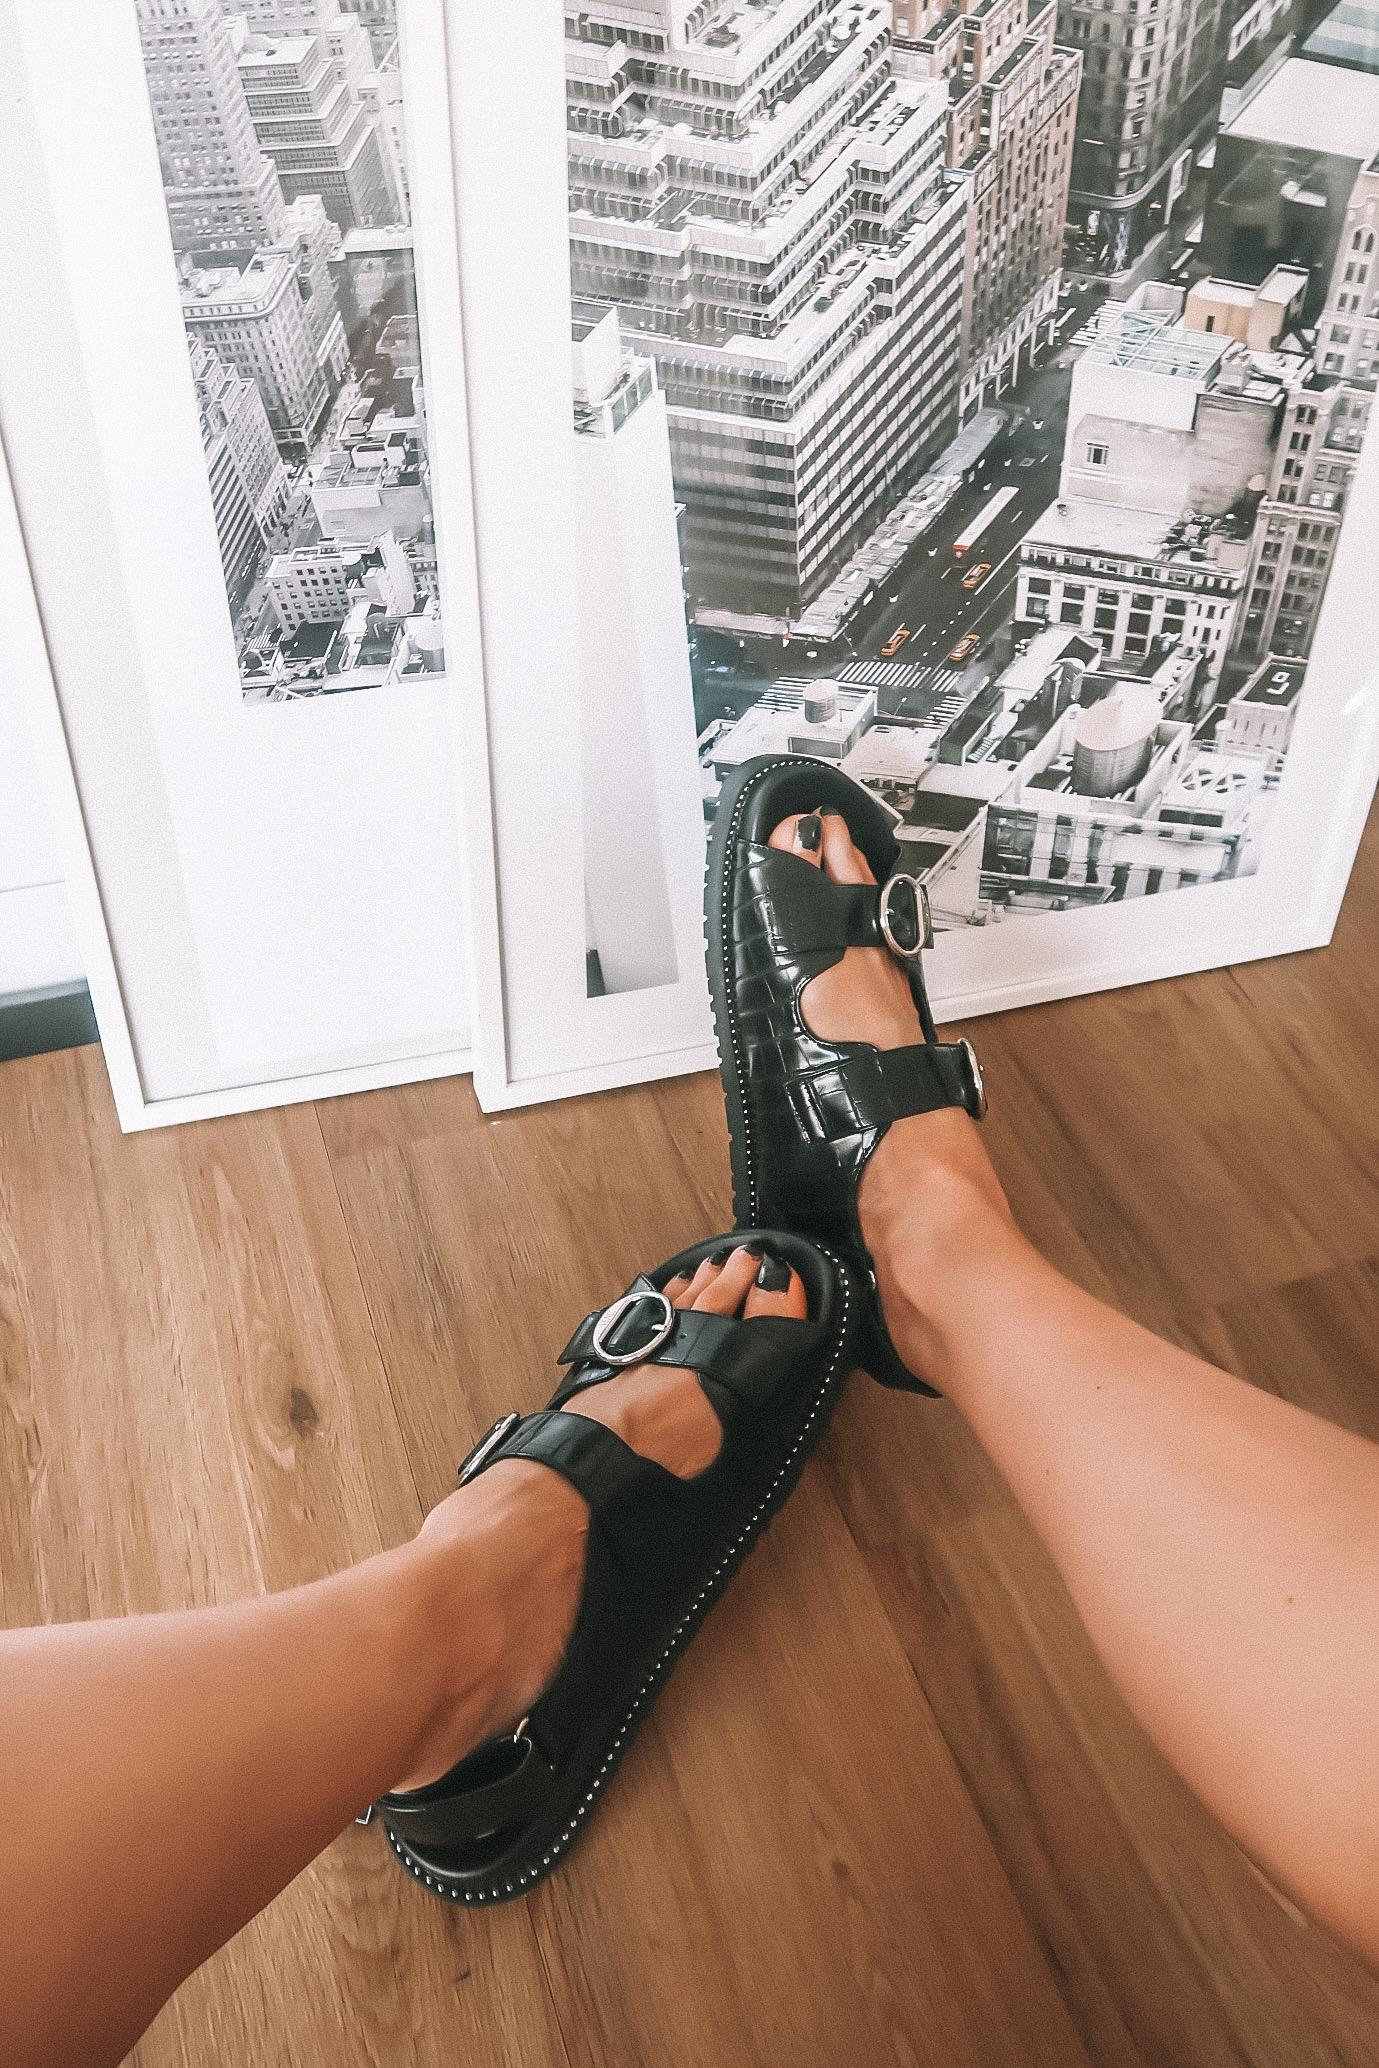 Zara Mock Croc Sporty Sandals - Ugly Grandad Sandals - SS19 Trend